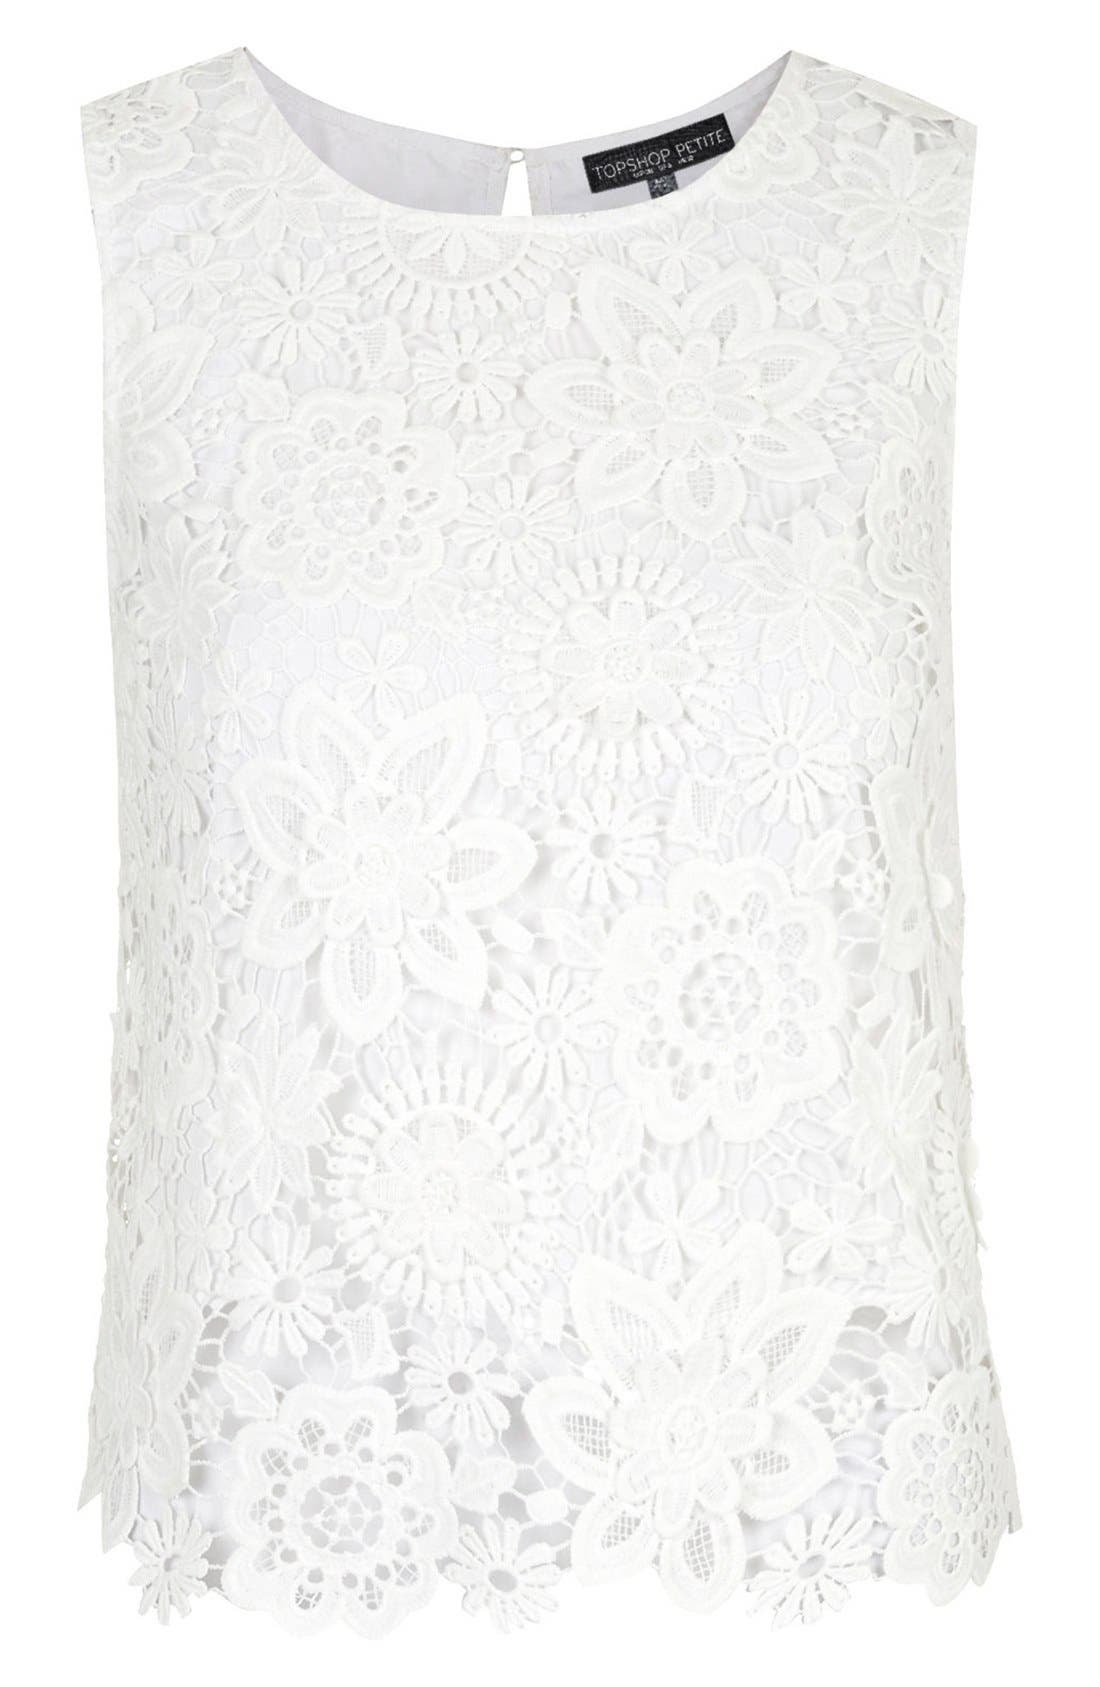 Alternate Image 3  - Topshop Crochet Lace Shell Top (Petite)